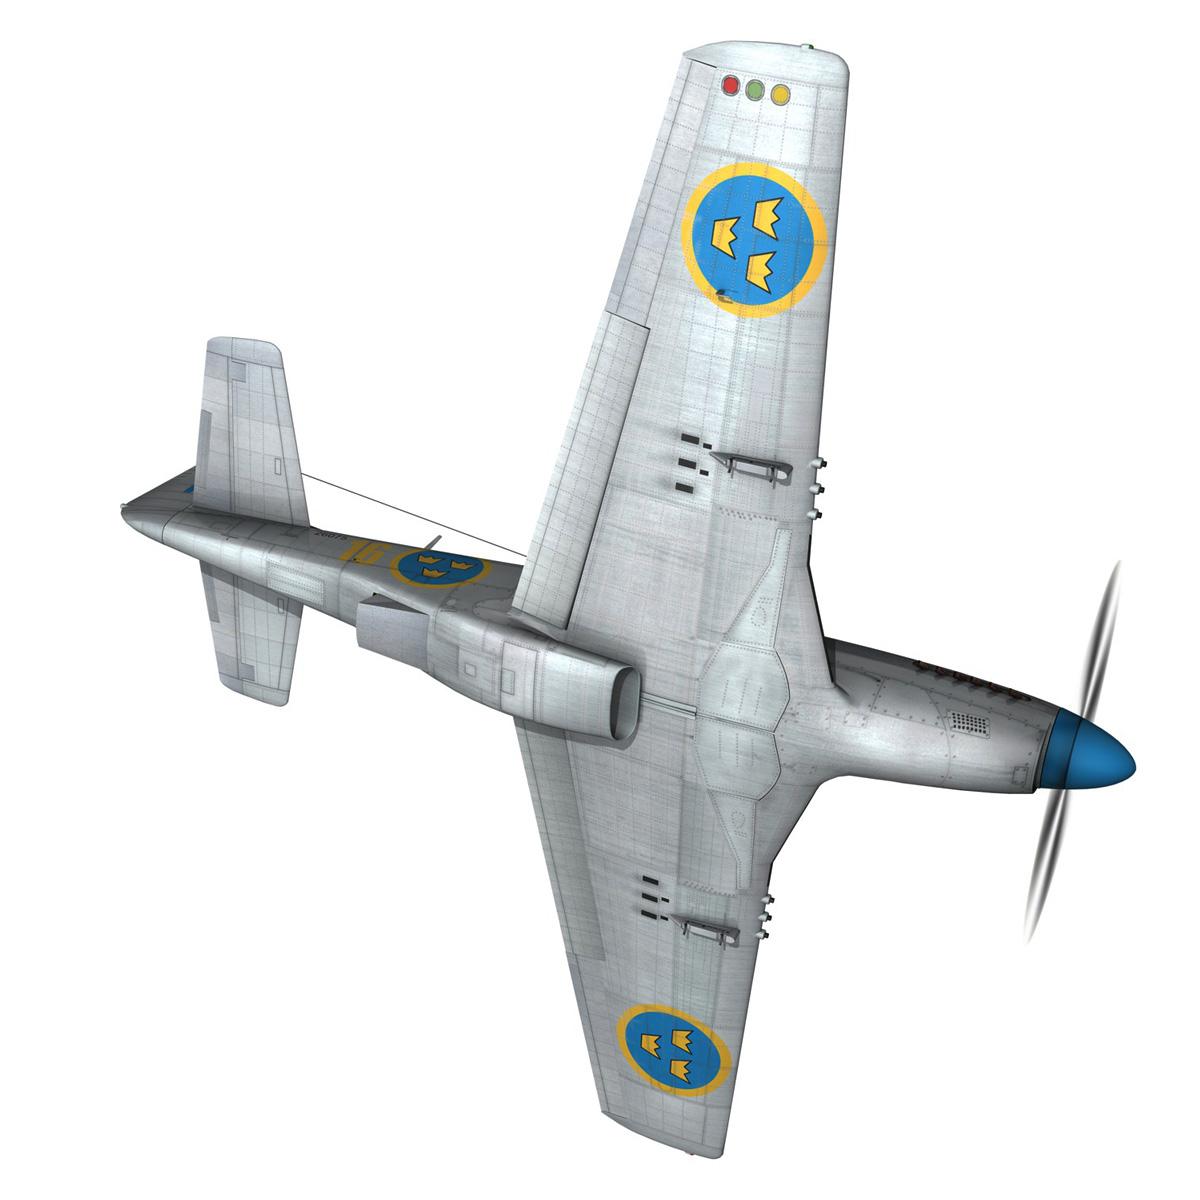 north american p-51d mustang – swedisch airforce 3d model fbx c4d lwo obj 268233